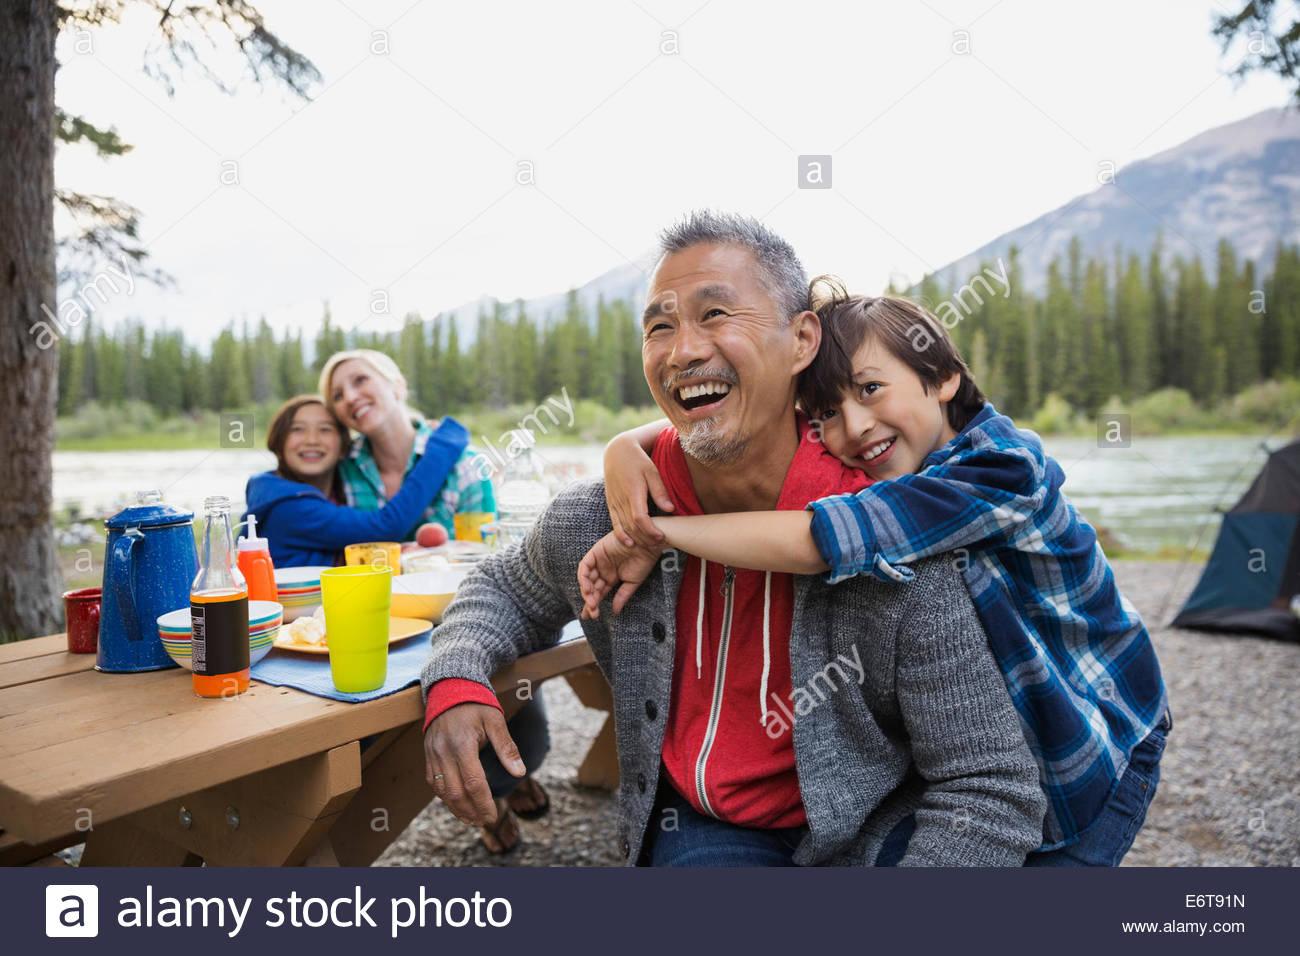 Familia relajante junto al camping Imagen De Stock